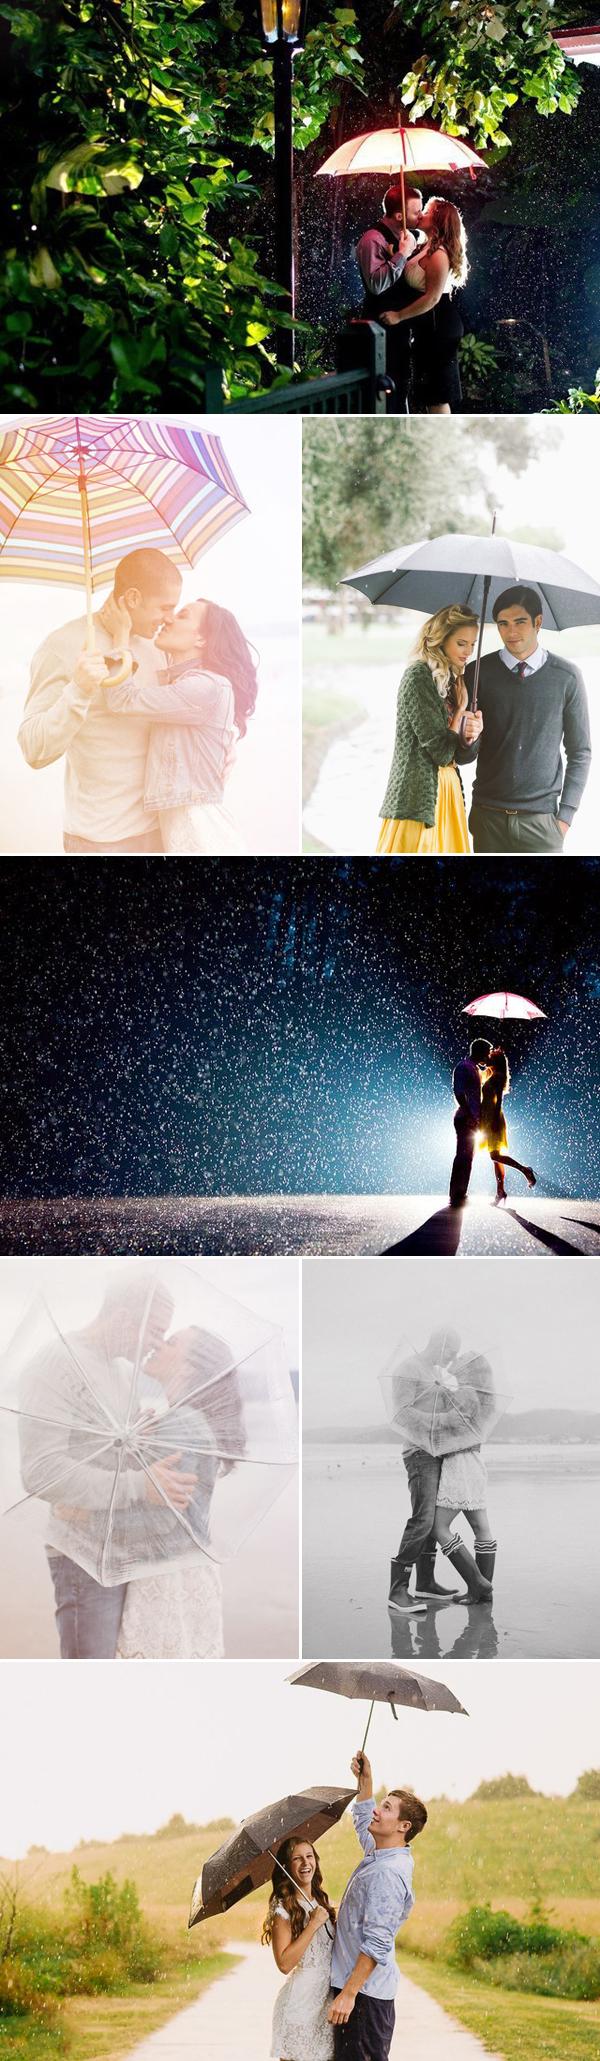 rain02-umbrella-9425-1414644395.jpg